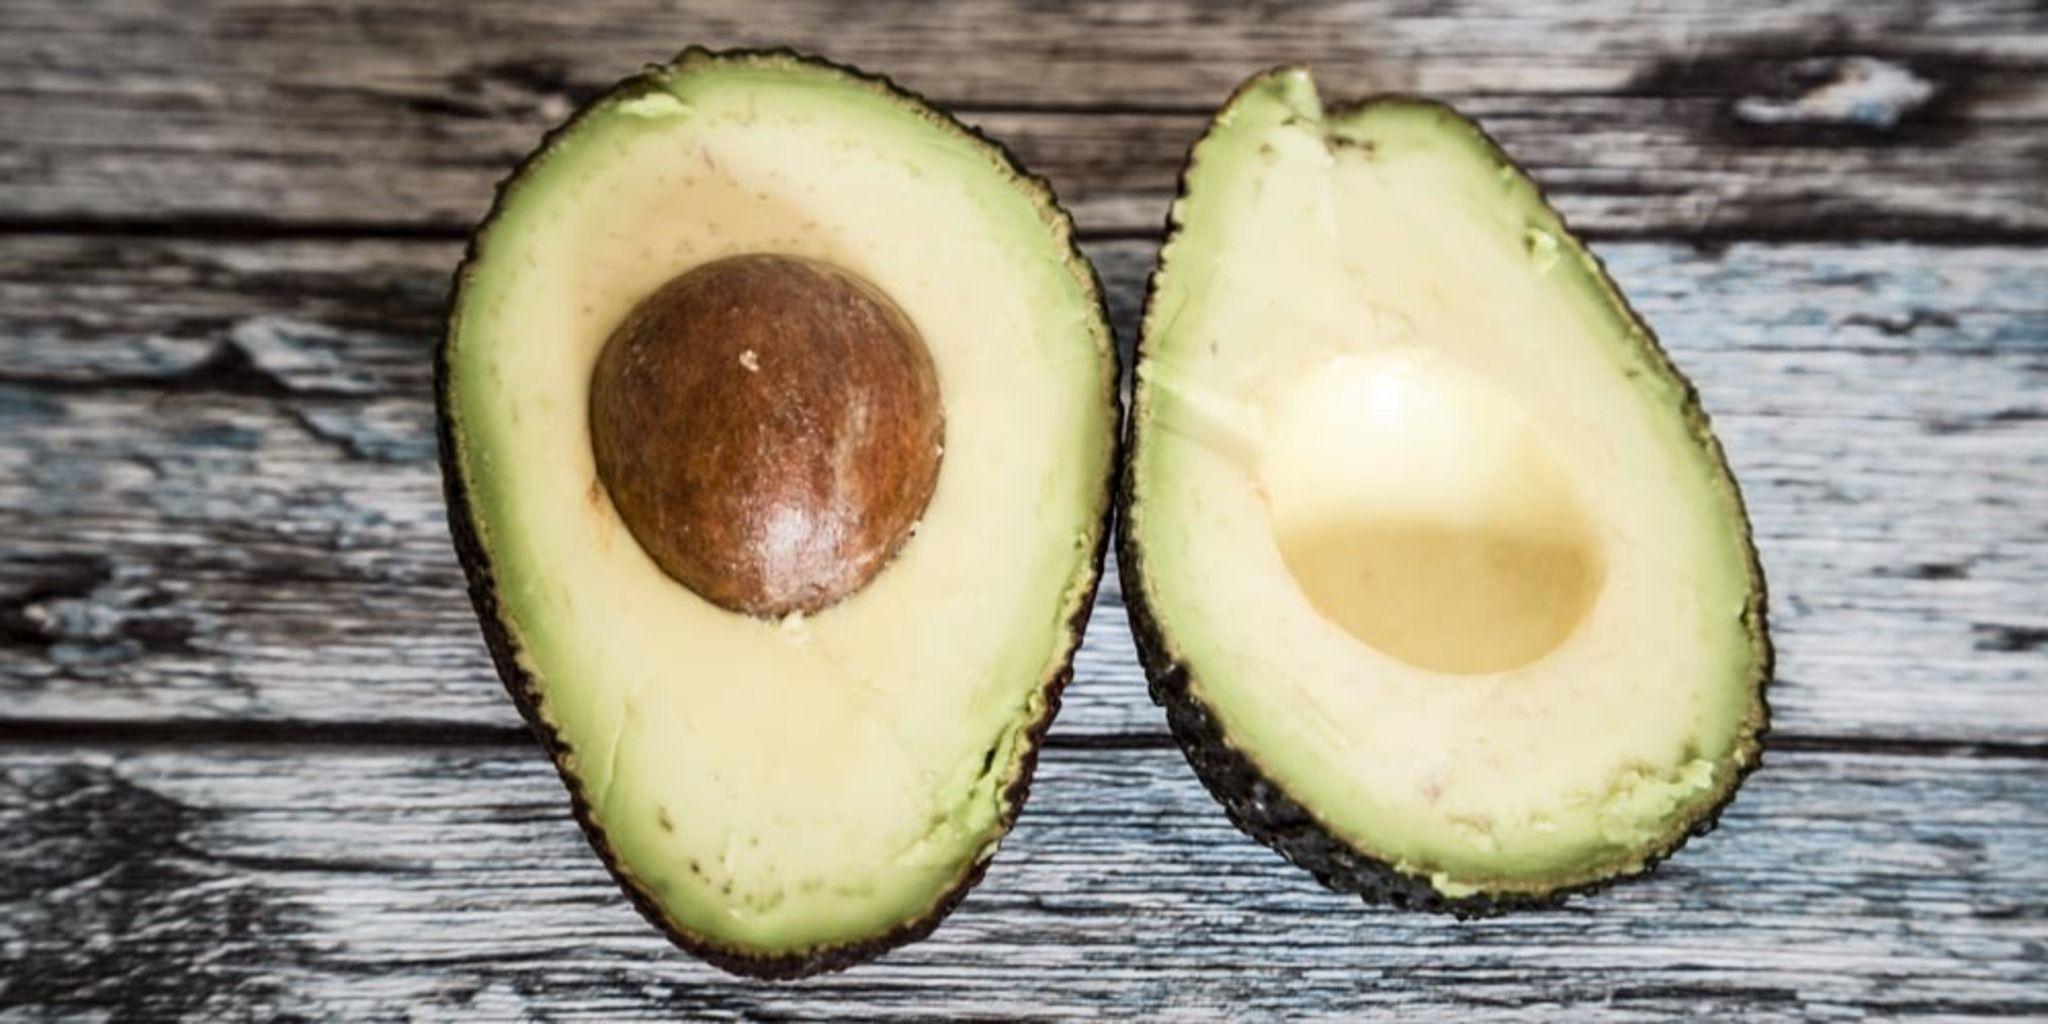 hoe avocado eten